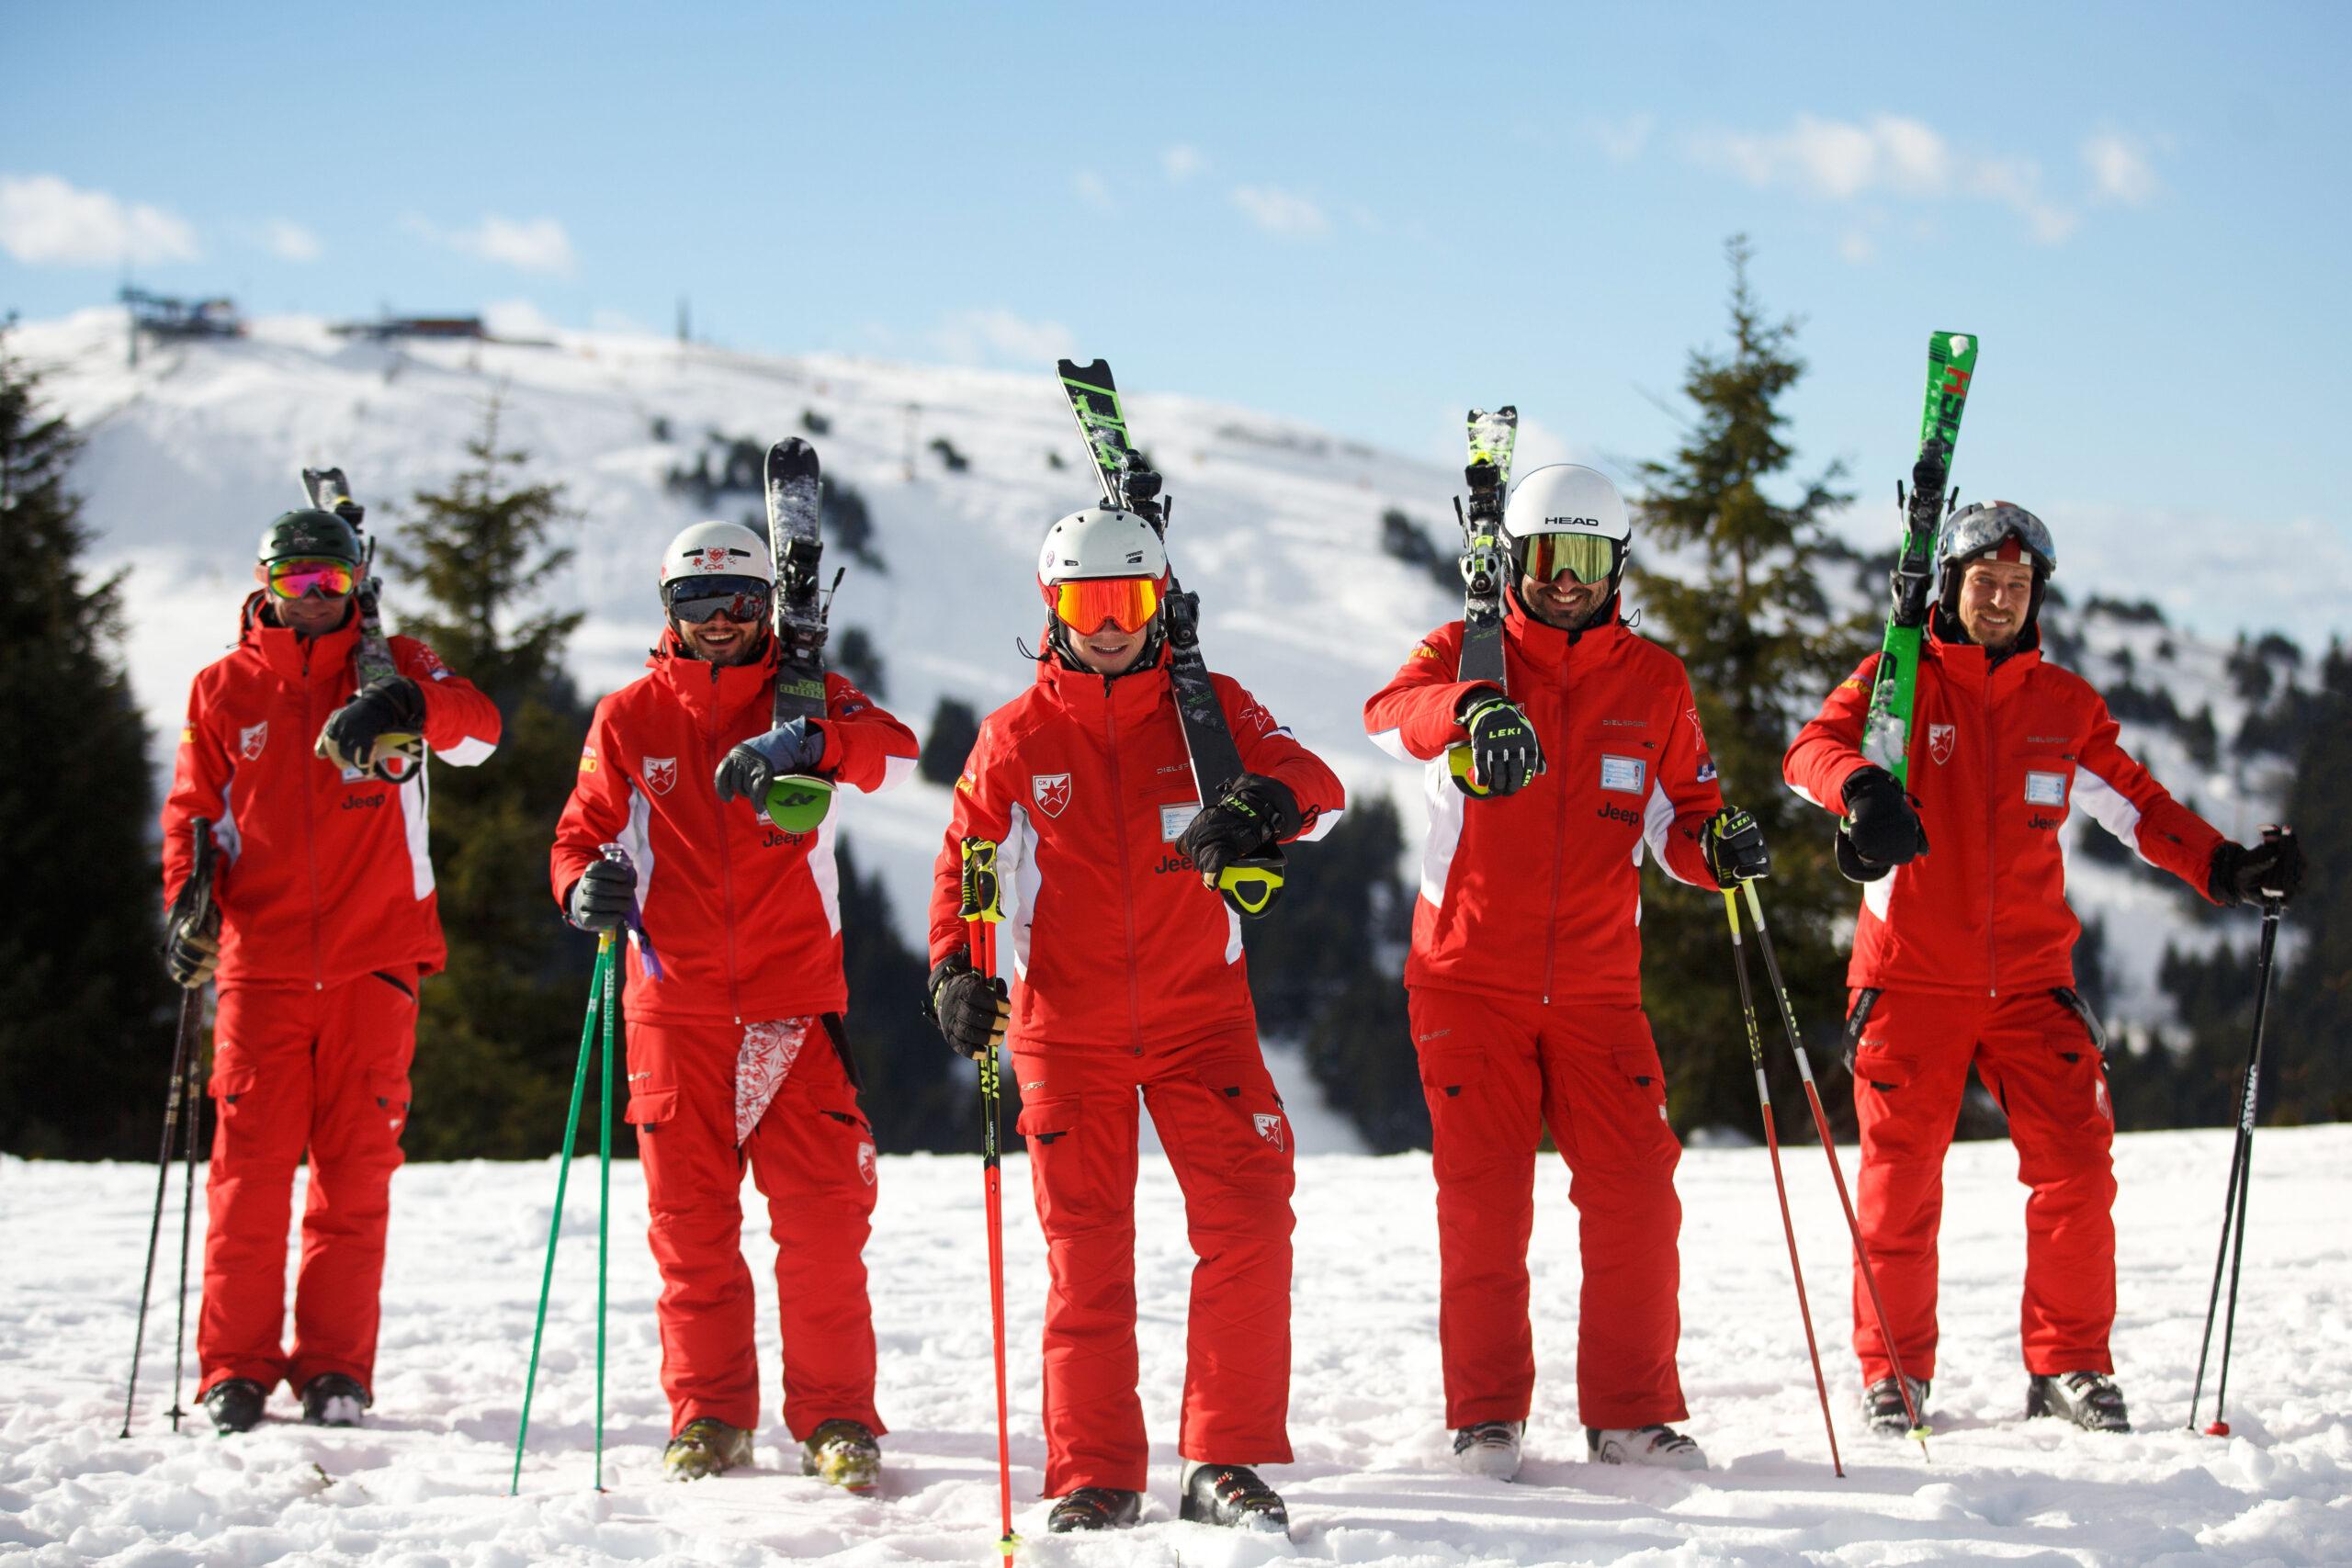 Insturktorski tim ski skole na Kopaoniku Crvena zvezda